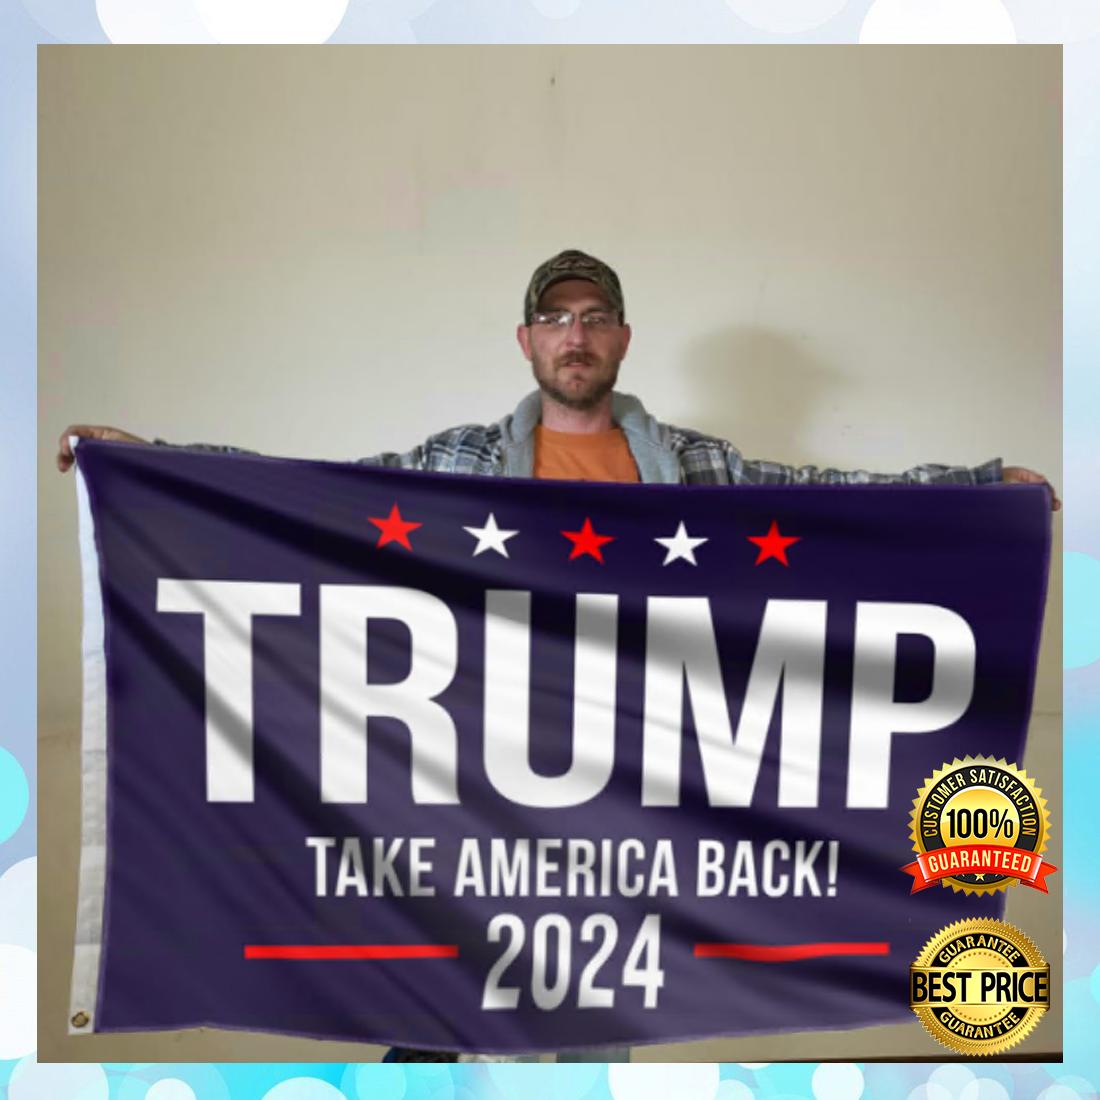 [Trend] Trump Take American Back 2024 Flag